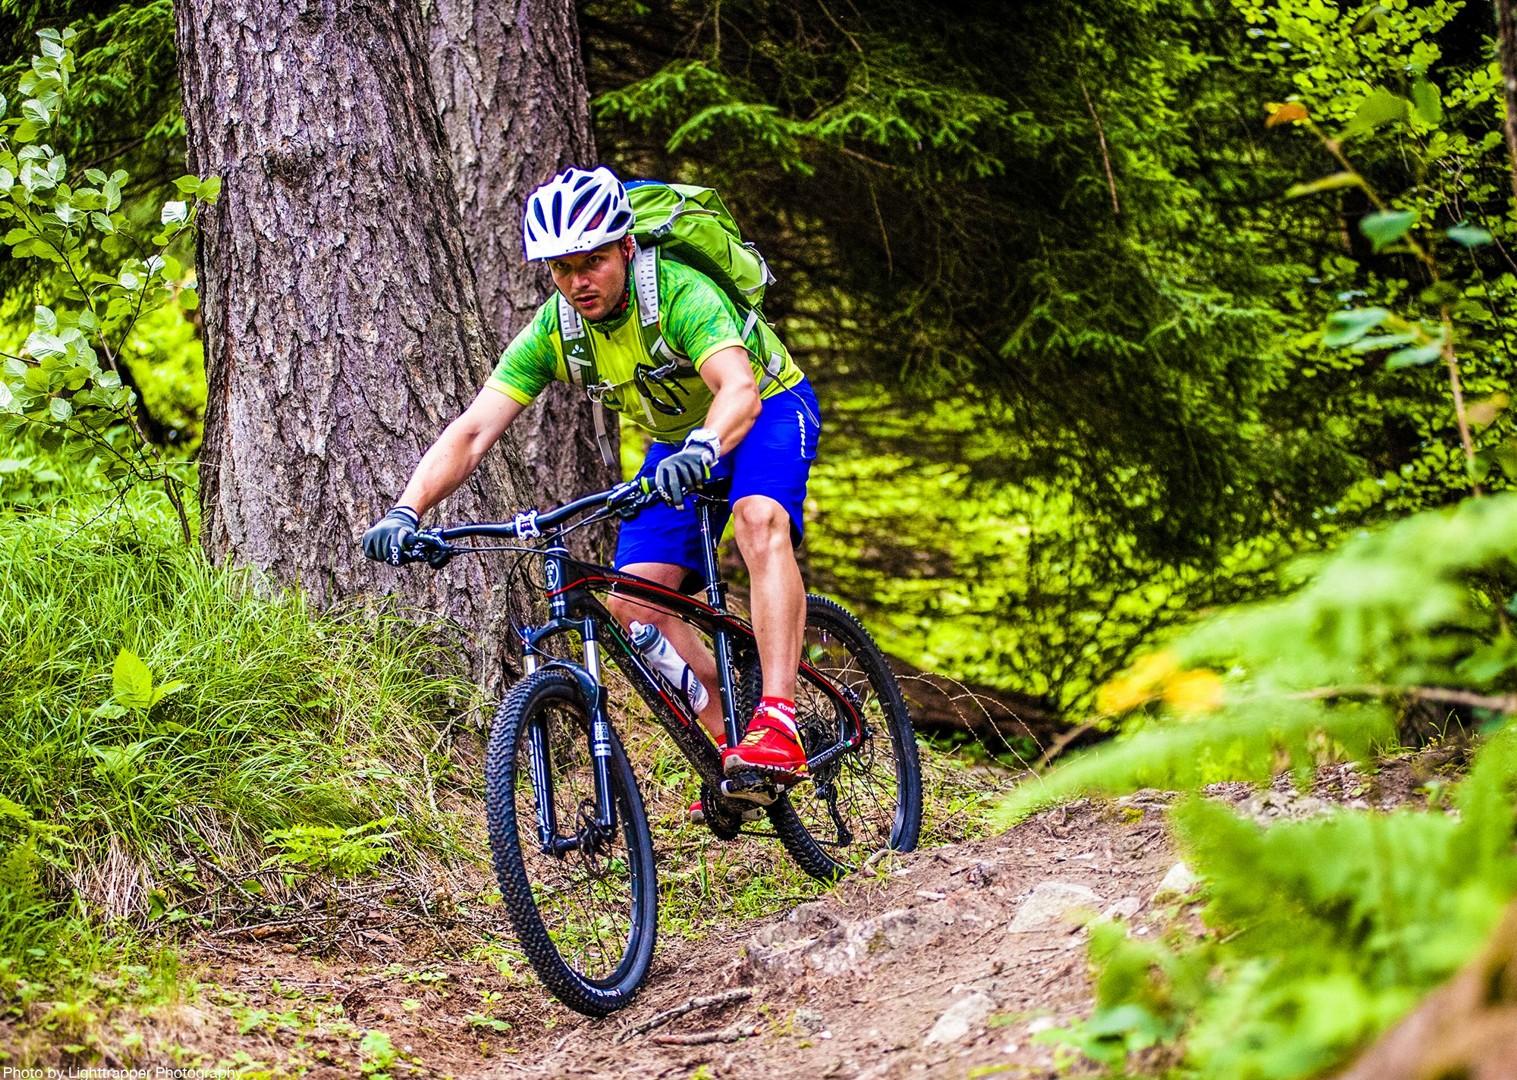 saddle_skedaddle_italy_2017_day6_brenta_dolomites_146-2.jpg - Italy - Dolomites of Brenta - Guided Mountain Bike Holiday - Mountain Biking